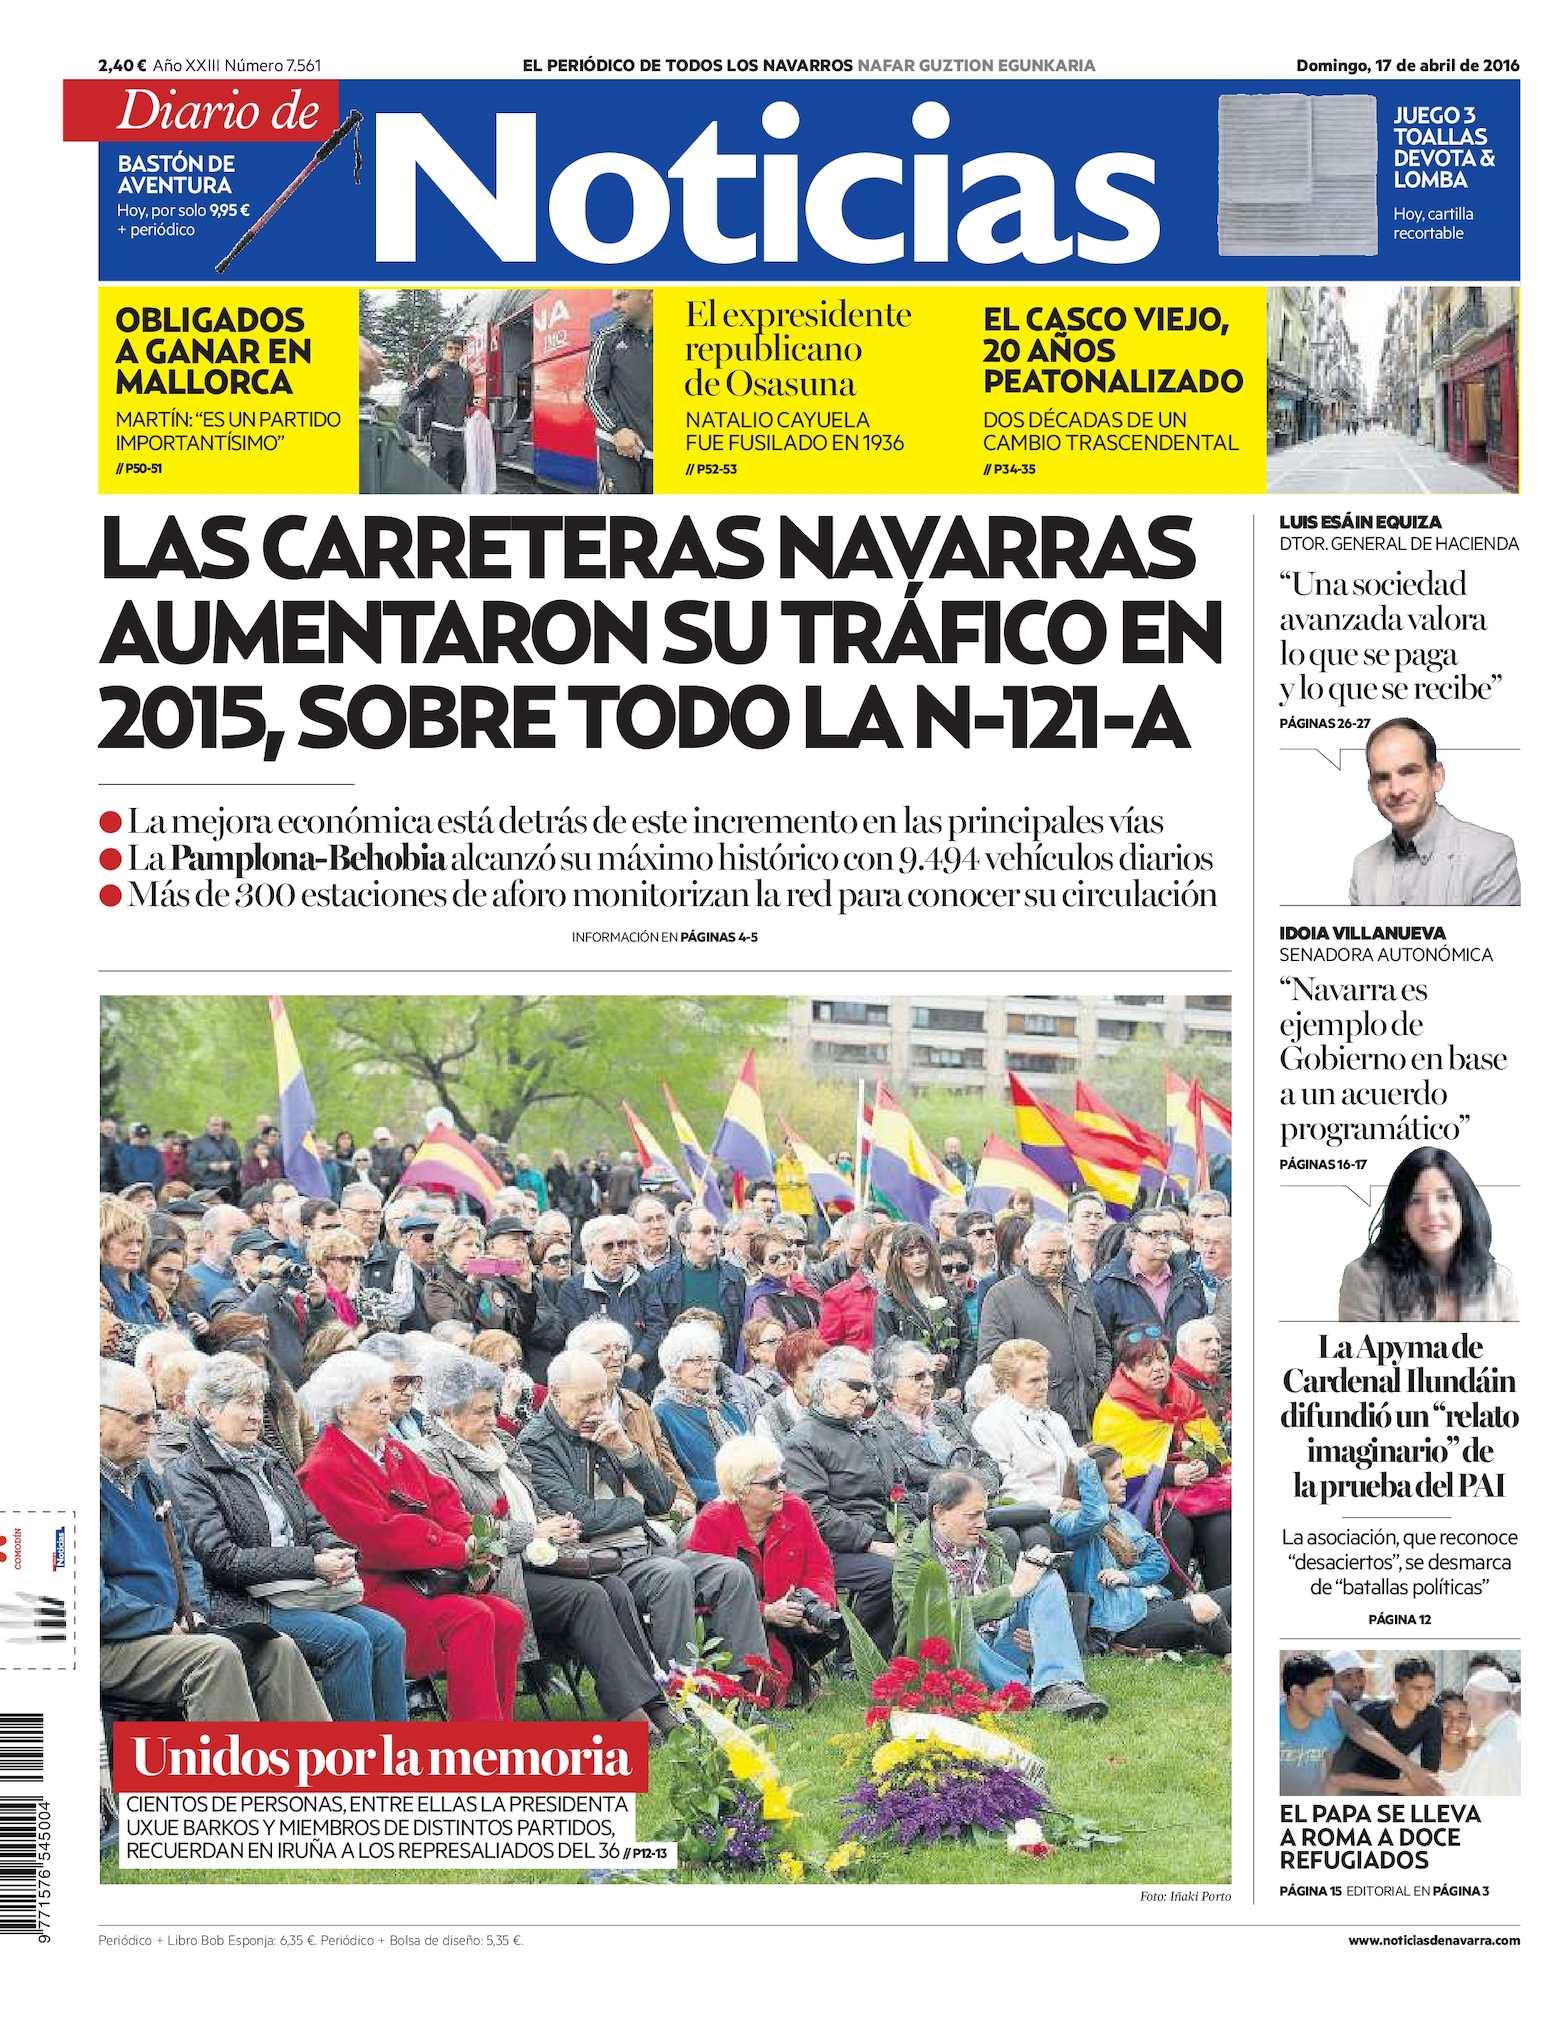 4525c27b376f Calaméo - Diario de Noticias 20160417